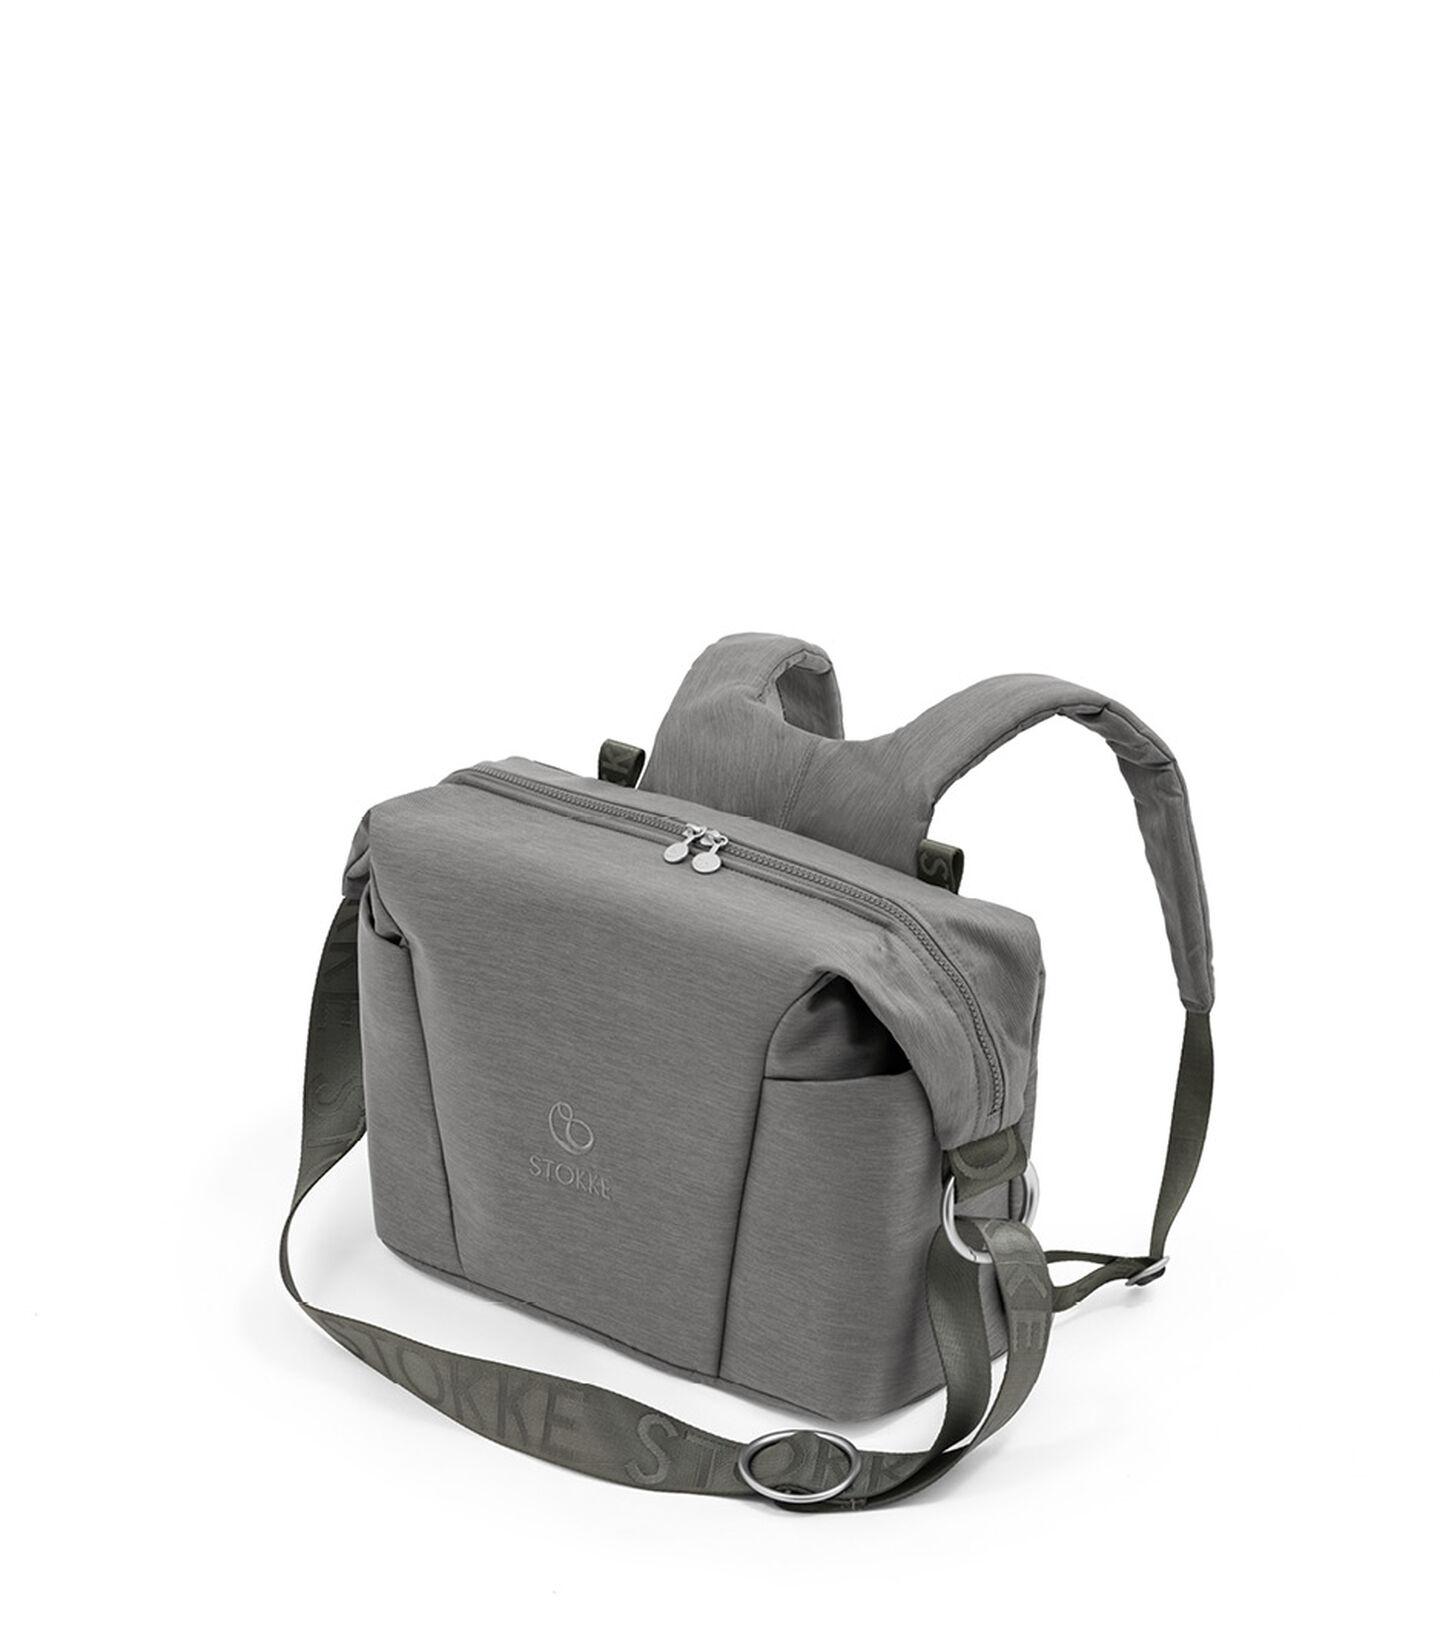 Stokke® Xplory® Pusletaske Modern Grey, Modern Grey, mainview view 1